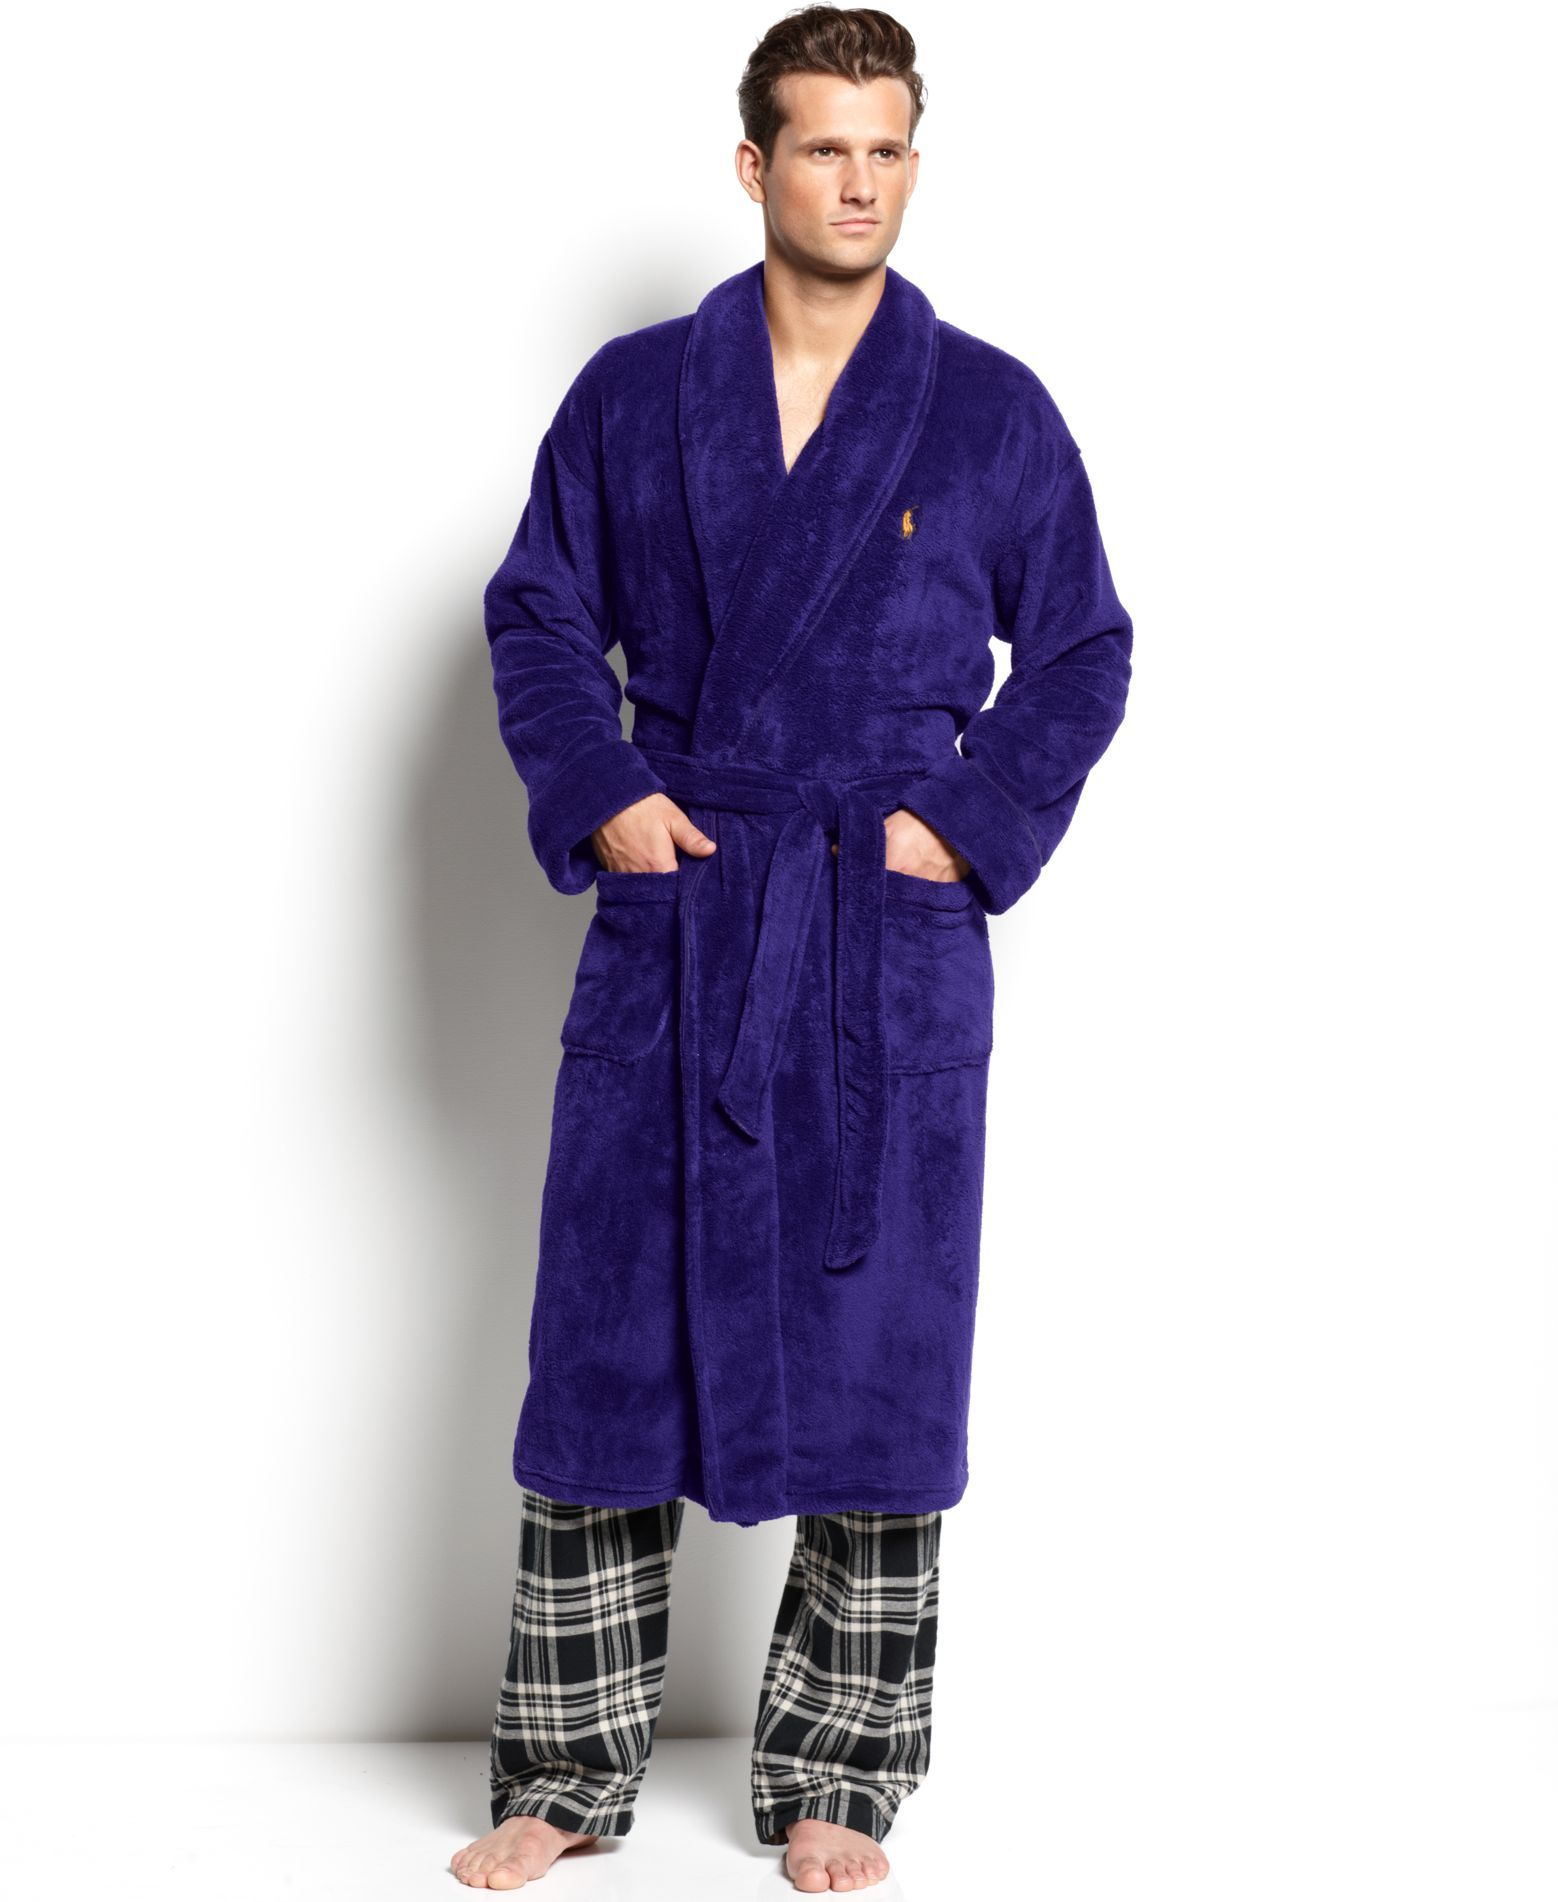 Polo Ralph Lauren Men s Sleepwear, Fleece Shawl Collar Robe ... 9f0494099ba